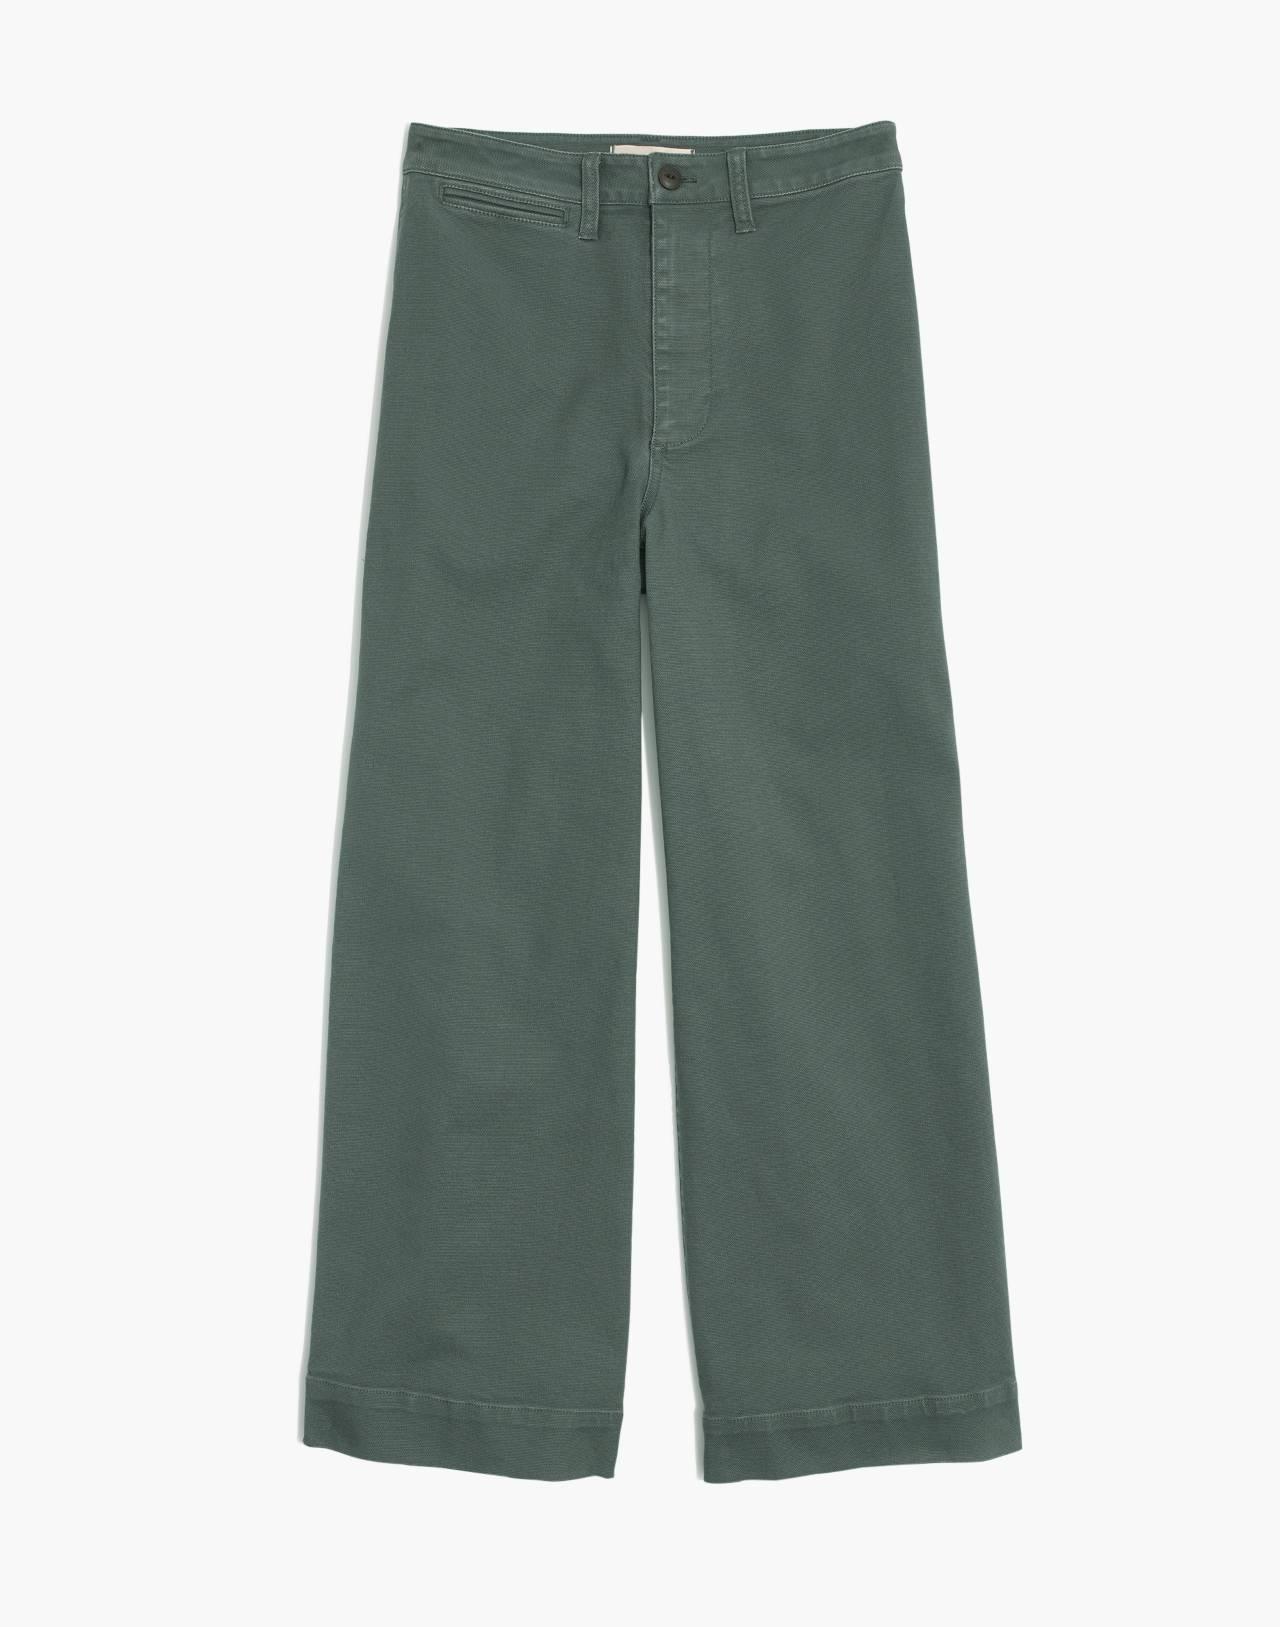 Tall Emmett Wide-Leg Crop Pants in architect green image 4